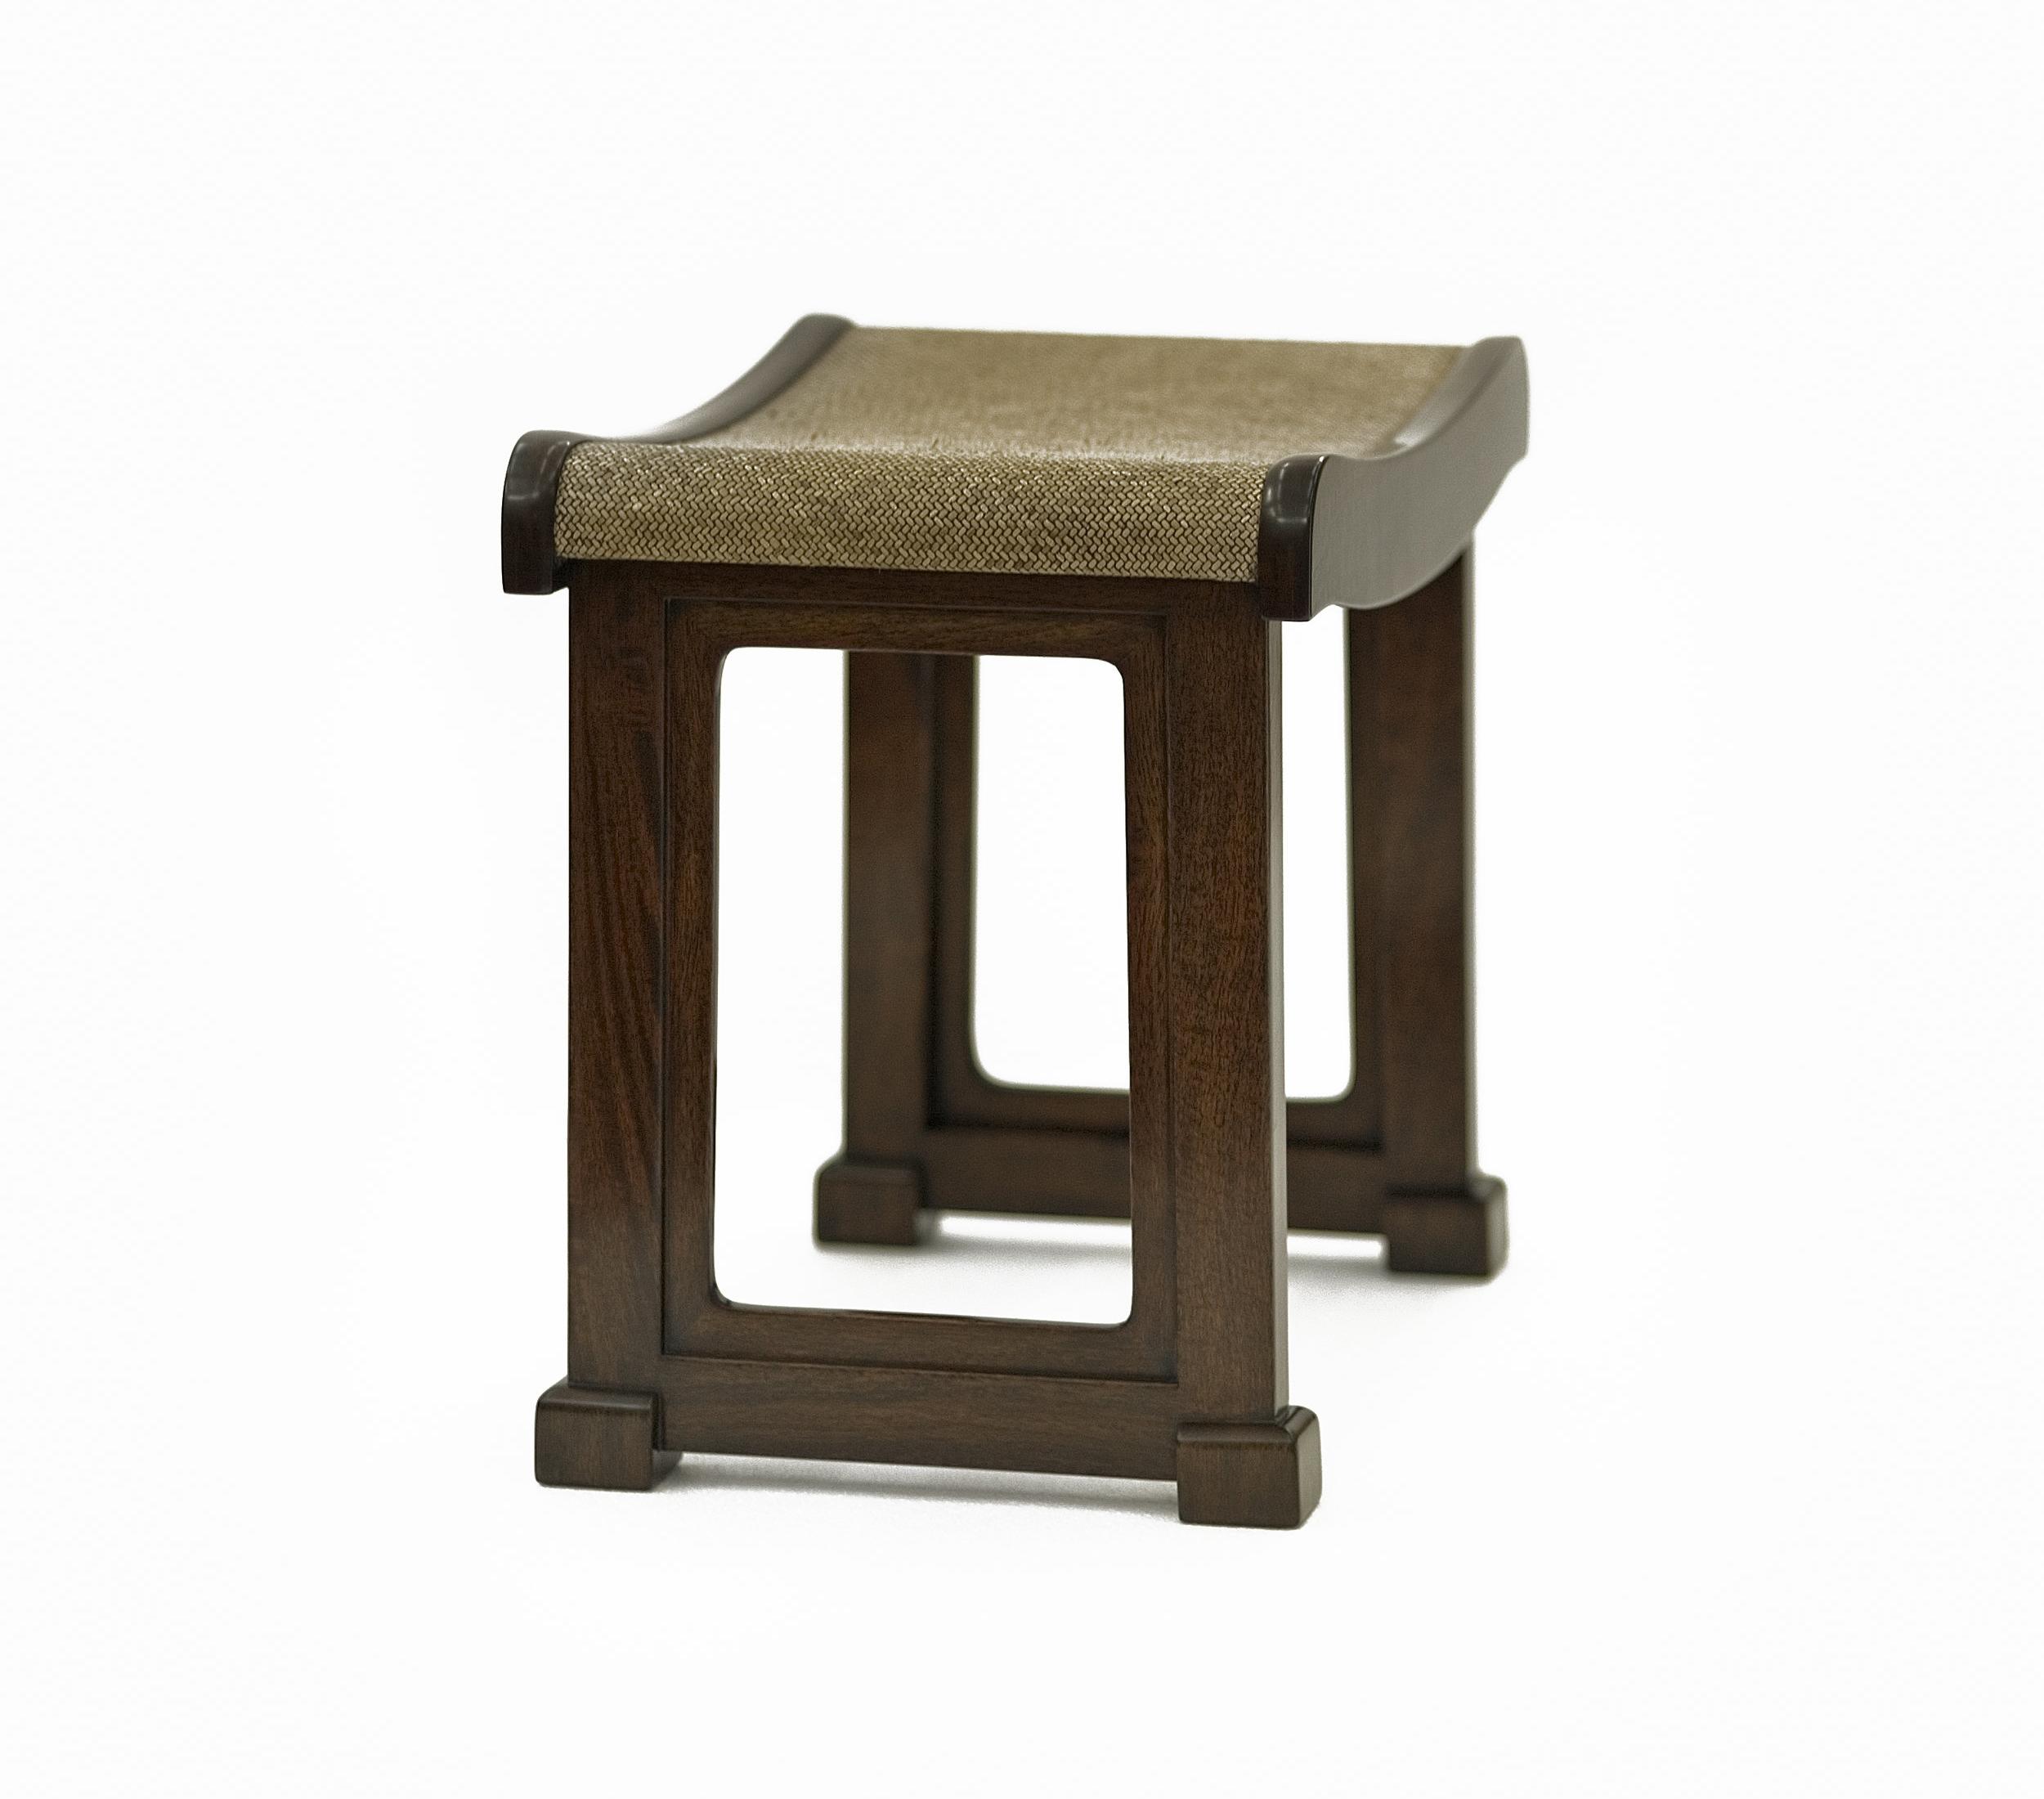 ....Ming Style Chinese furniture : Stool..明式中式家具: 凳子....